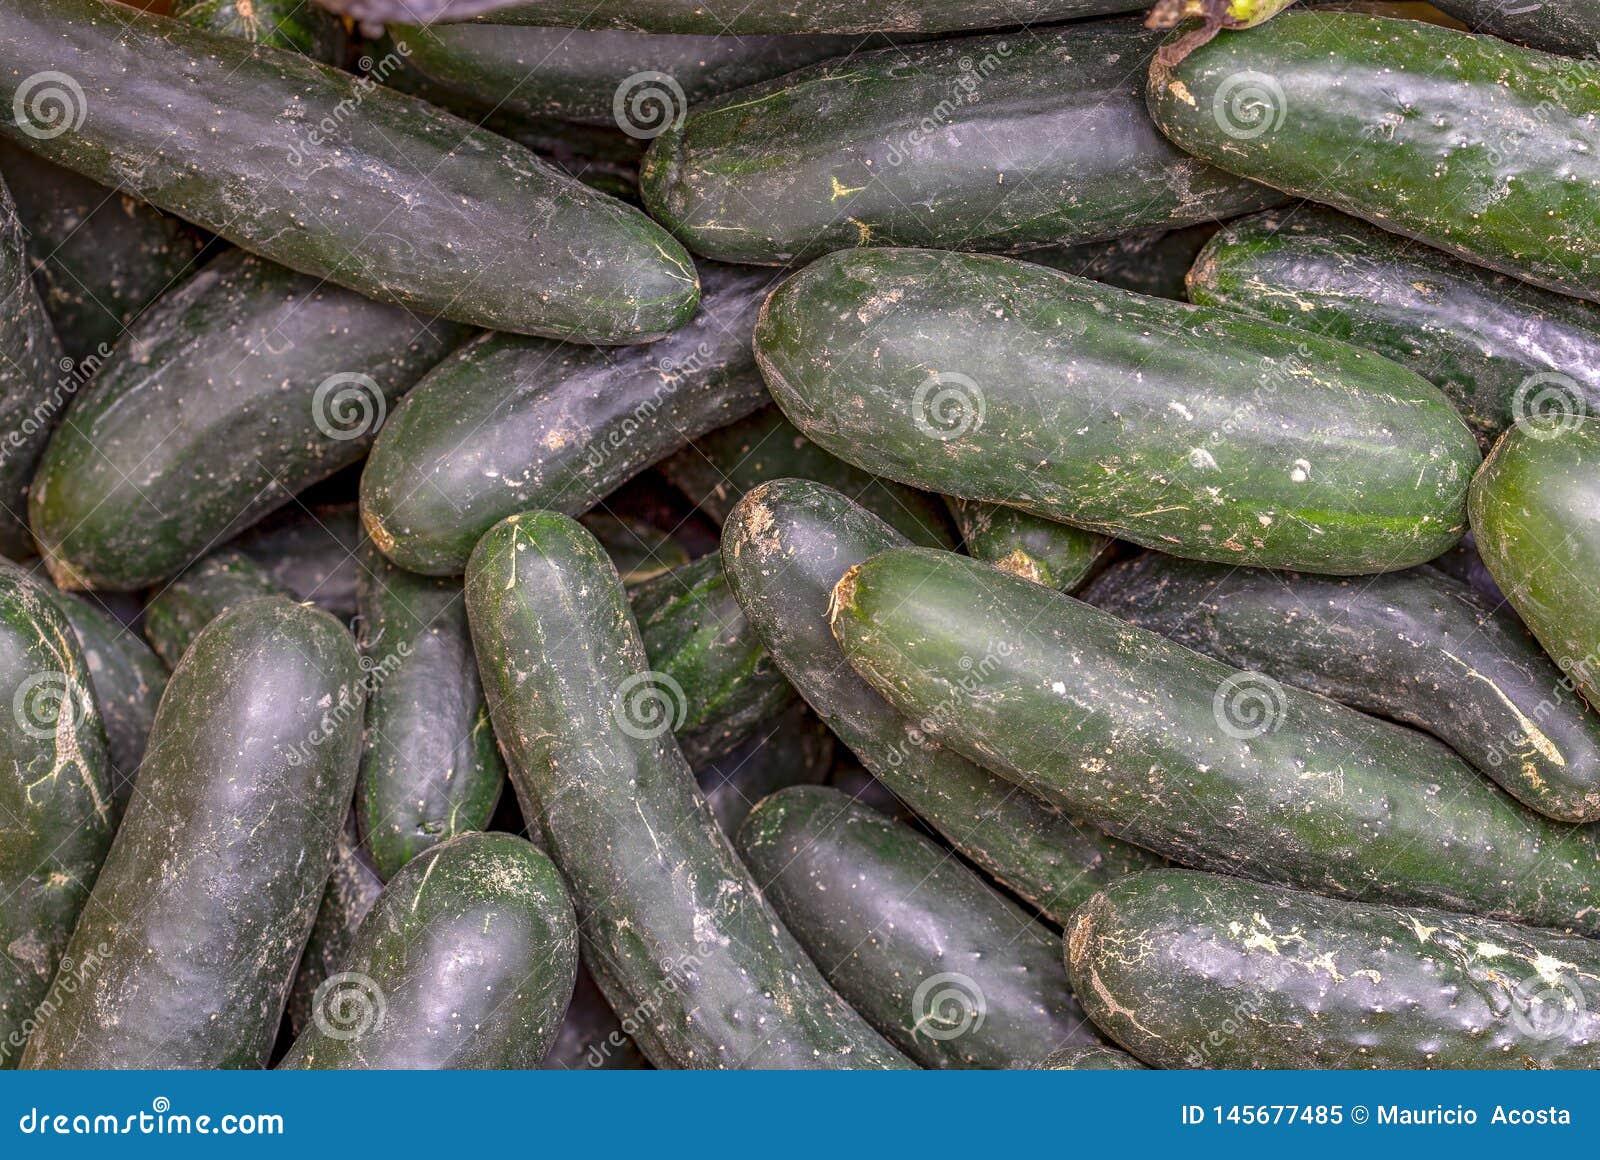 Un montón de pepinos verdes